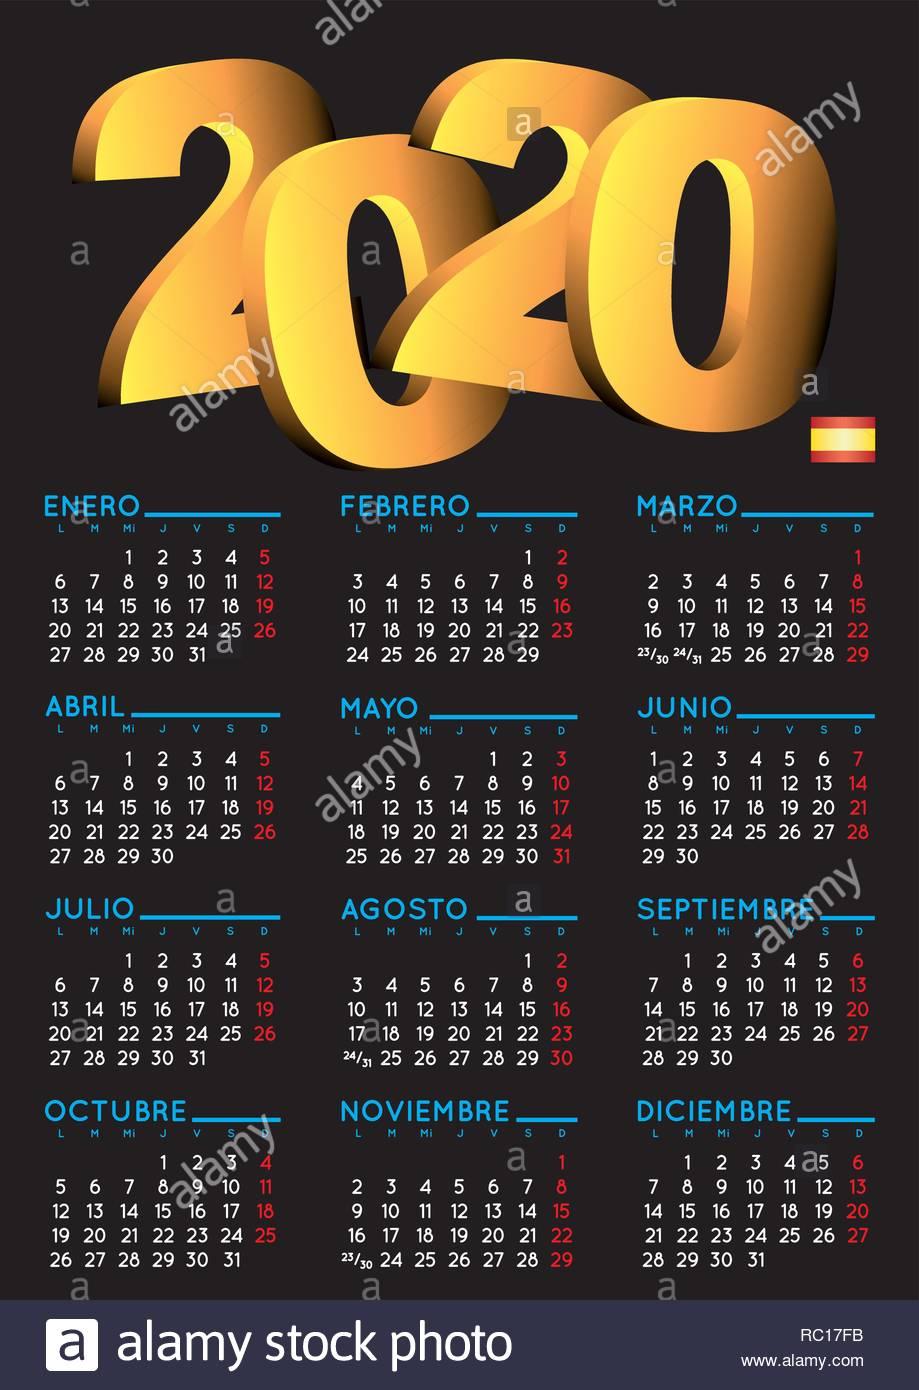 Calendario Del Ano 2020 En Espanol.Calendario Espanol 2020 Ano 2020 Calendario Calendario